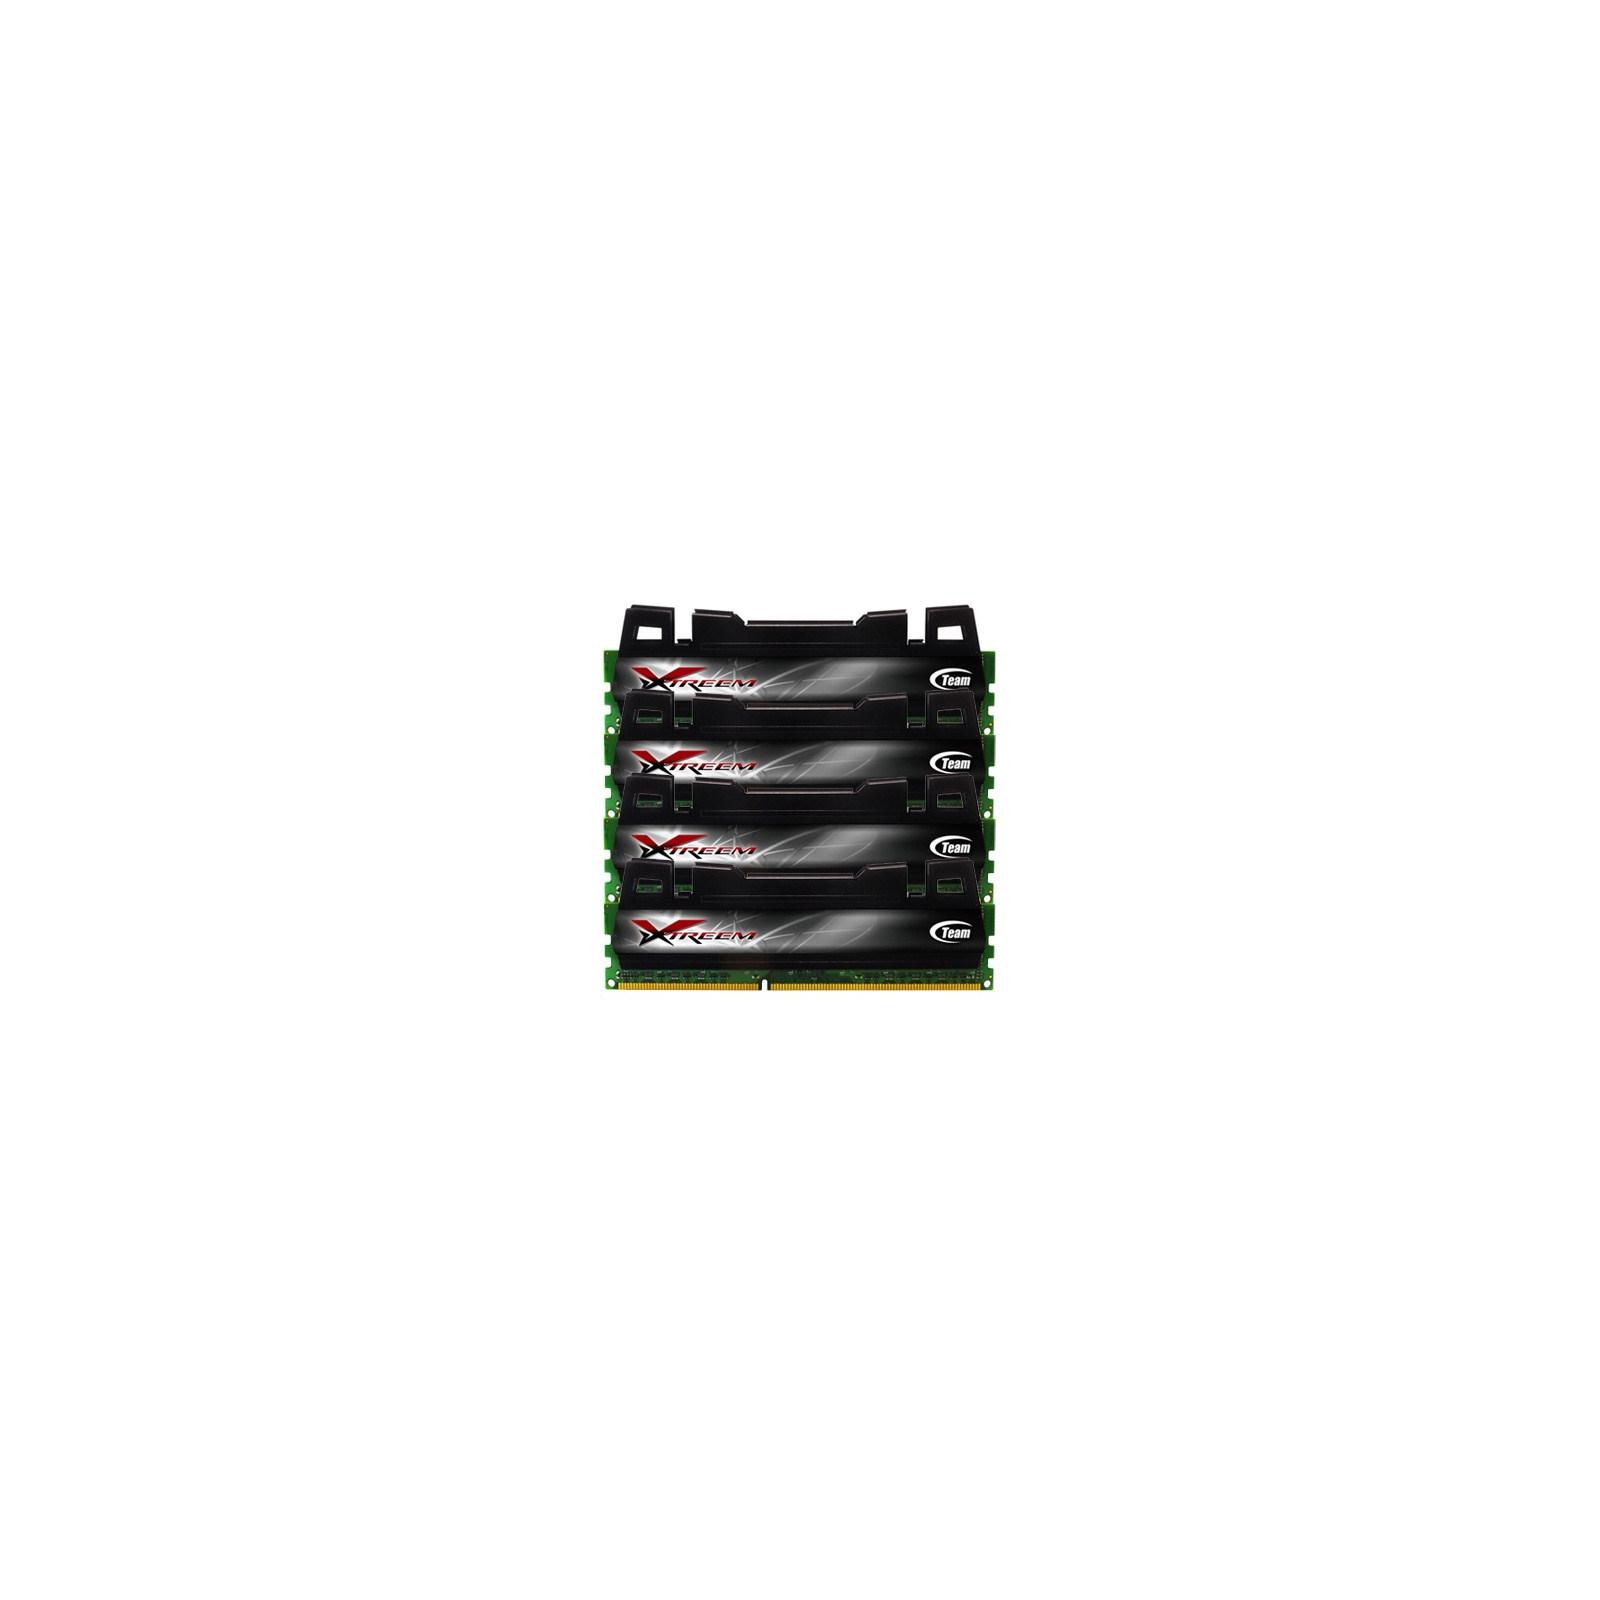 Модуль памяти для компьютера DDR3 32GB (4x8GB) 1600 MHz Team (TDD332G1600HC9QC01)